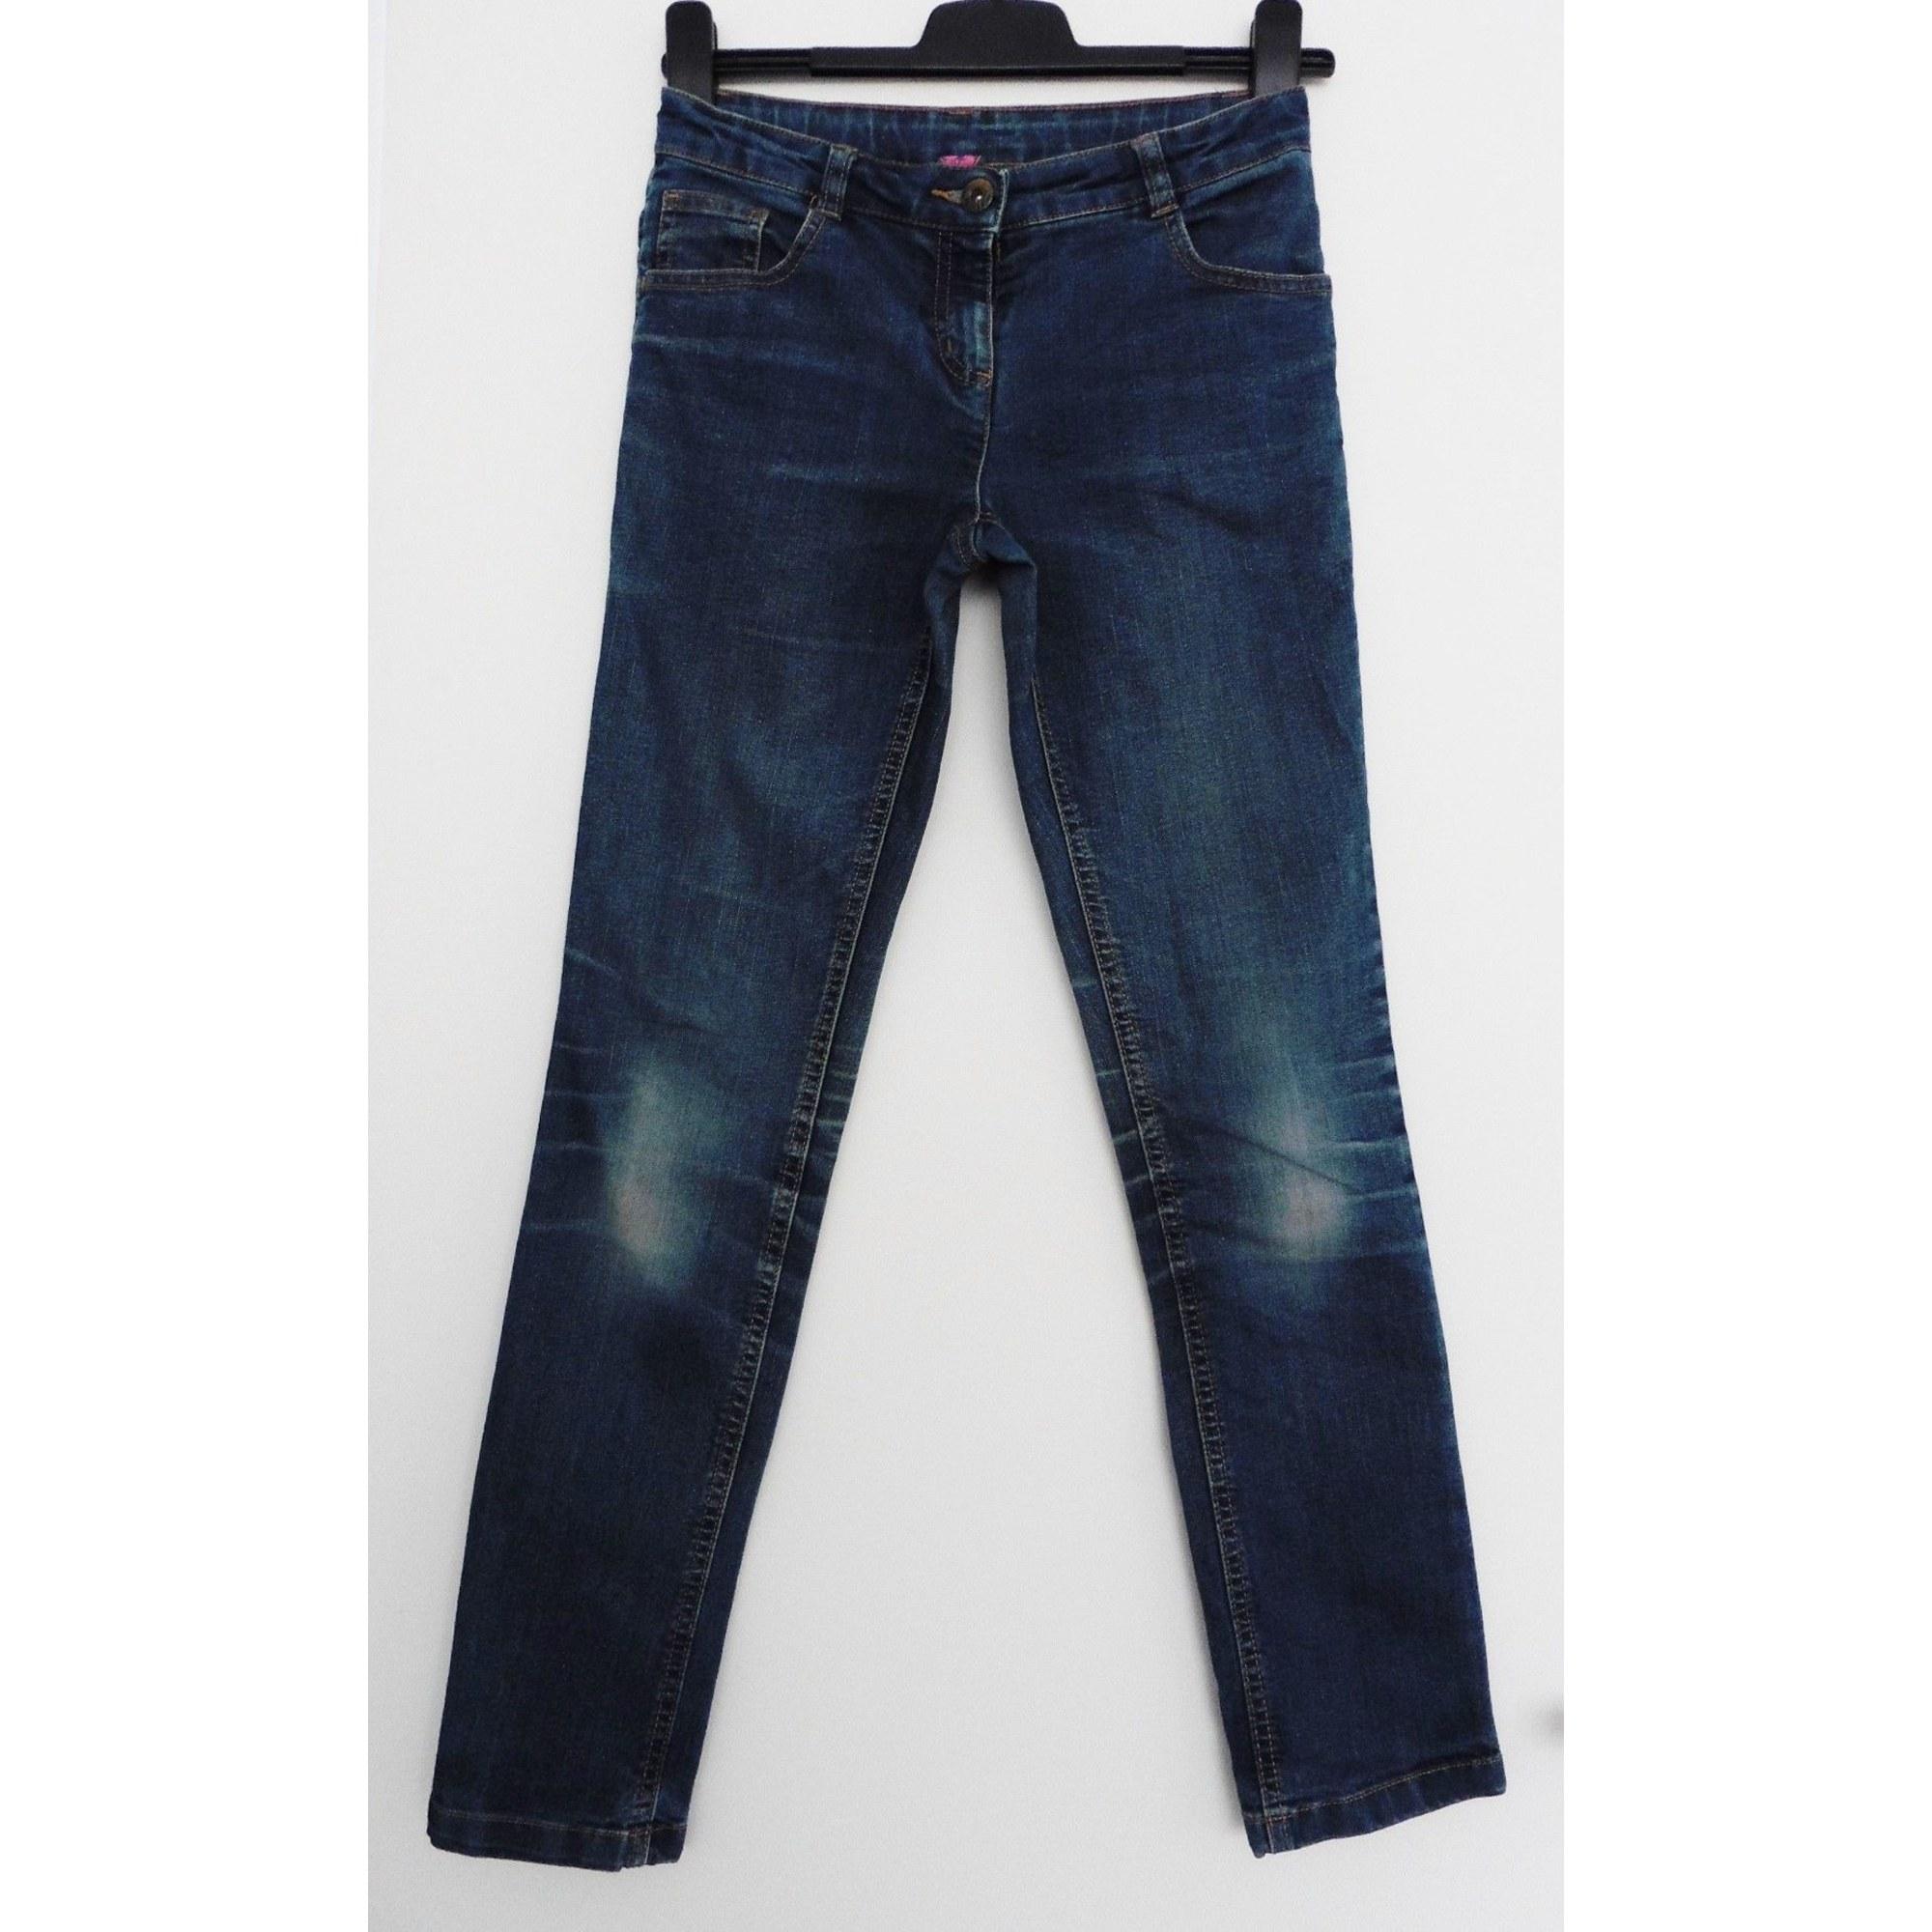 Jeans droit BILOOK Bleu, bleu marine, bleu turquoise